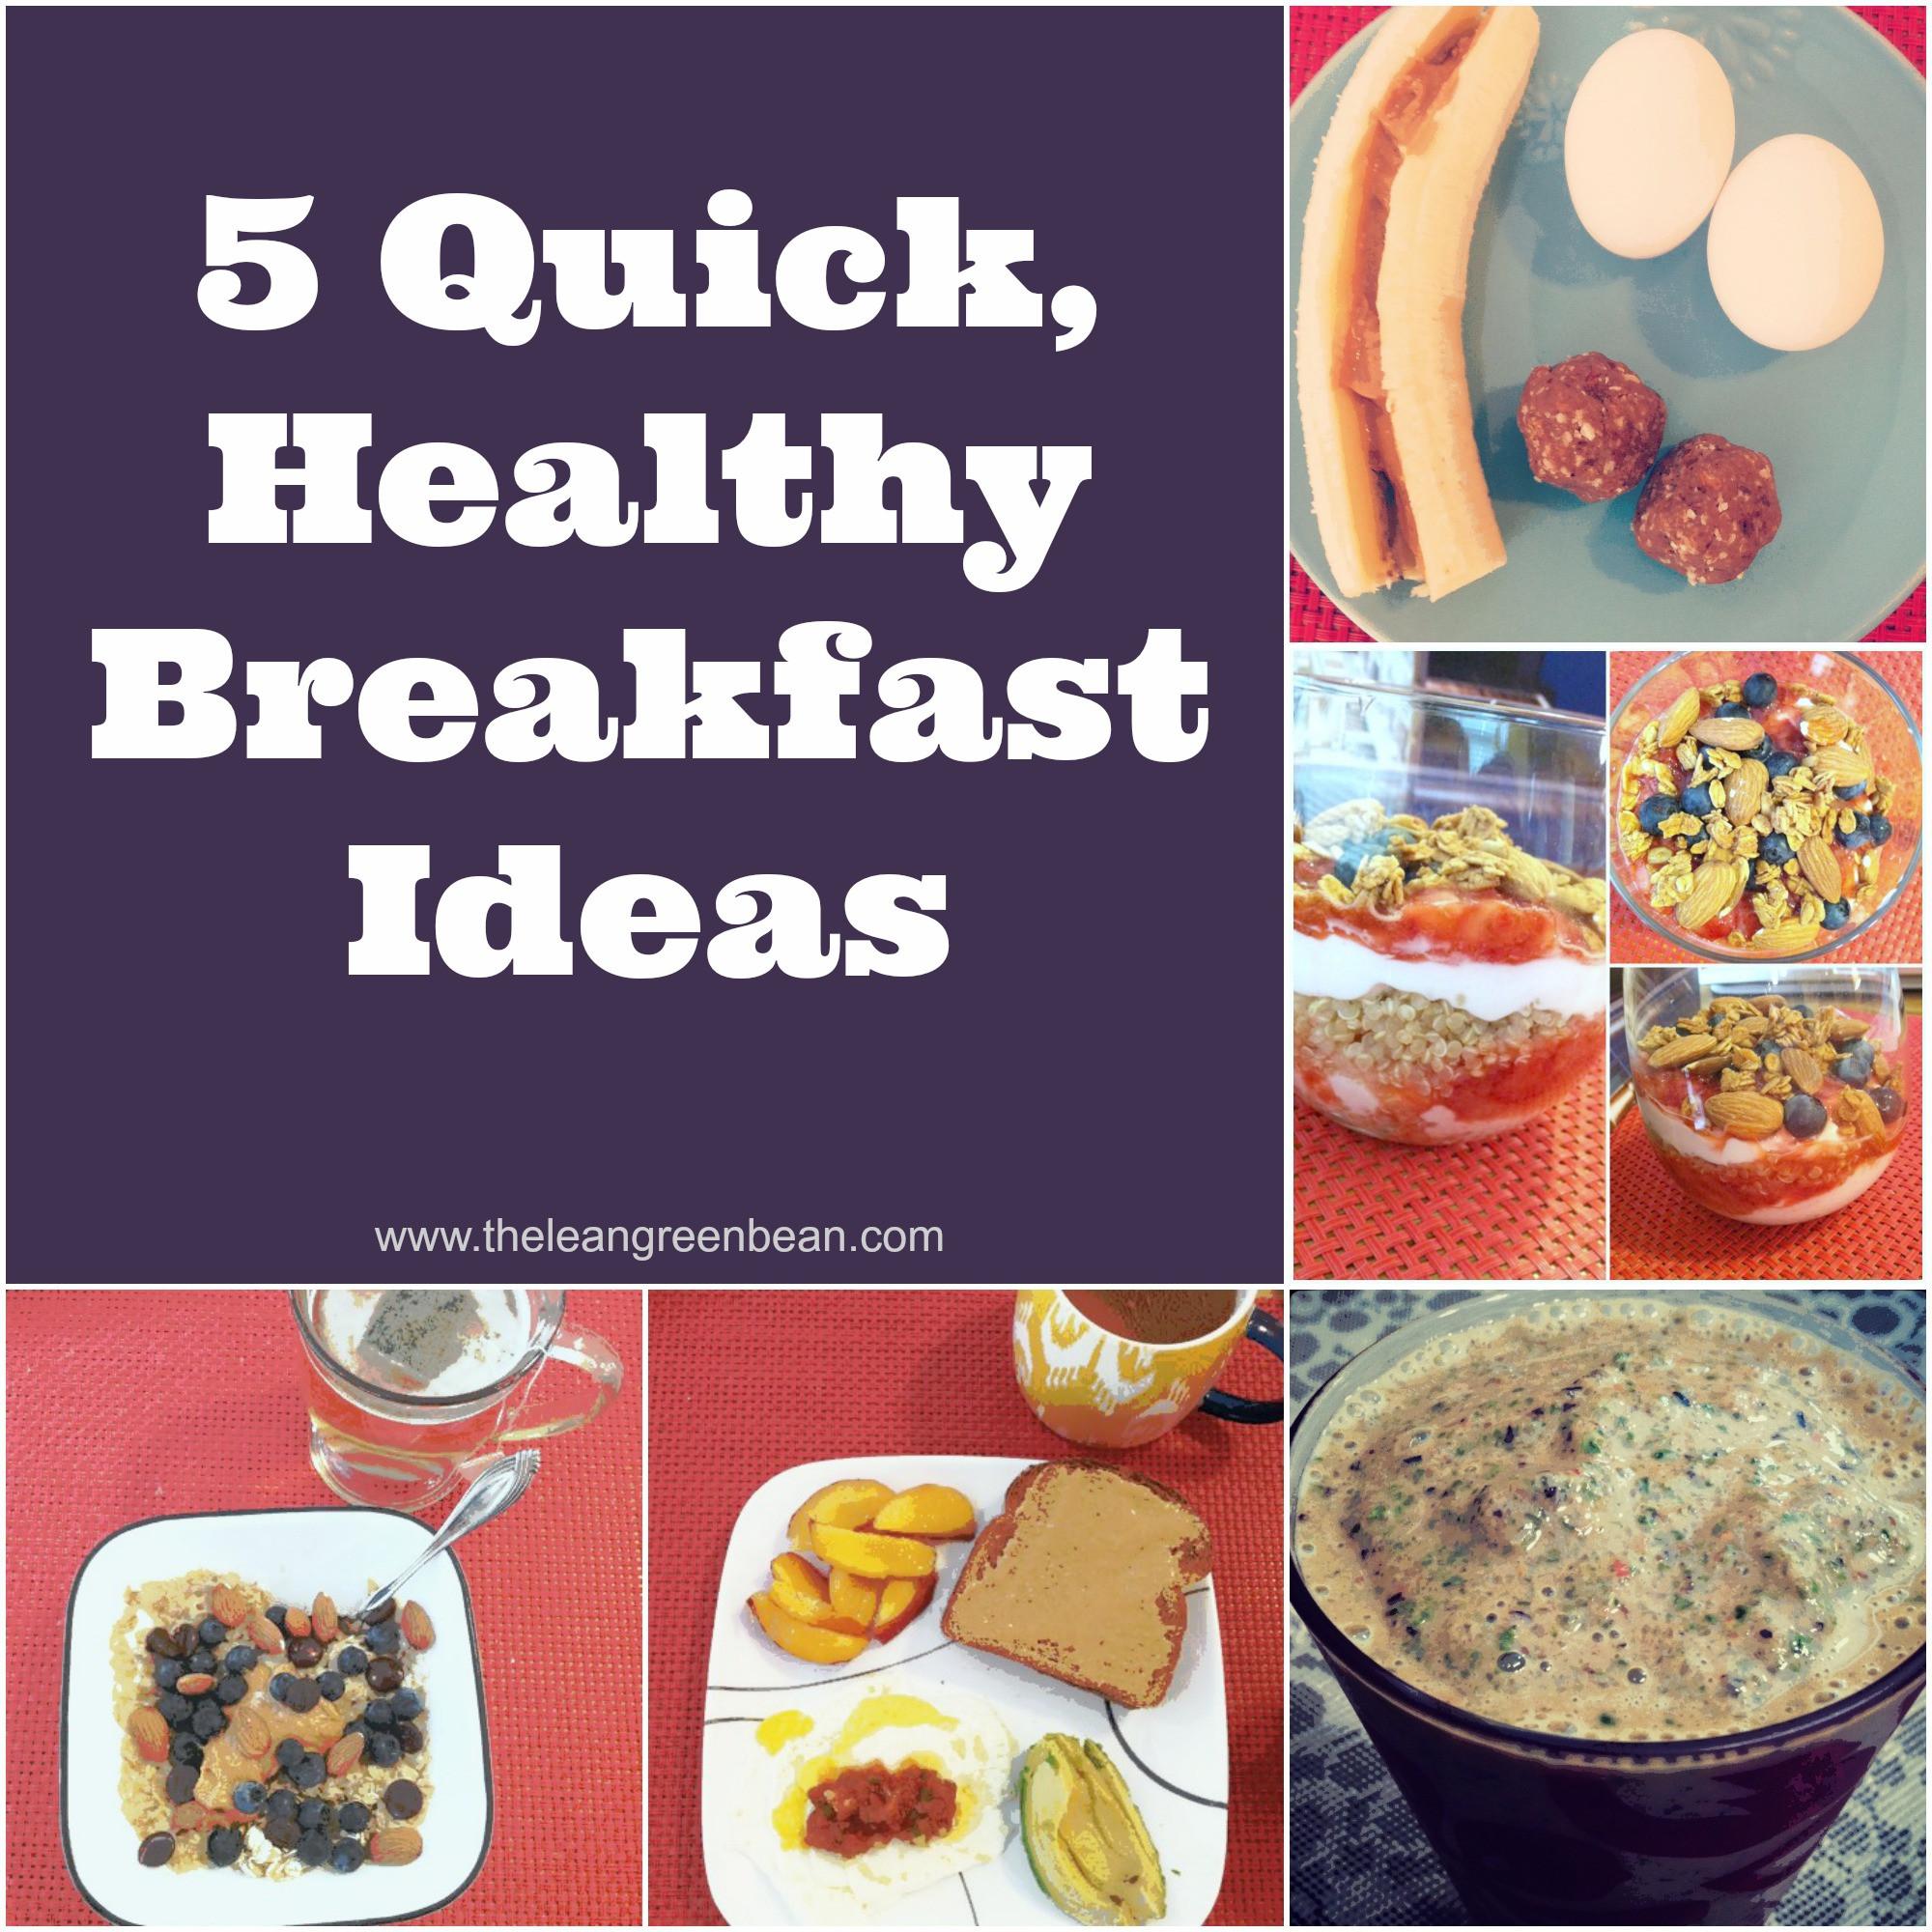 Healthy Quick Breakfast Ideas  5 Quick Healthy Breakfast Ideas from a Registered Dietitian